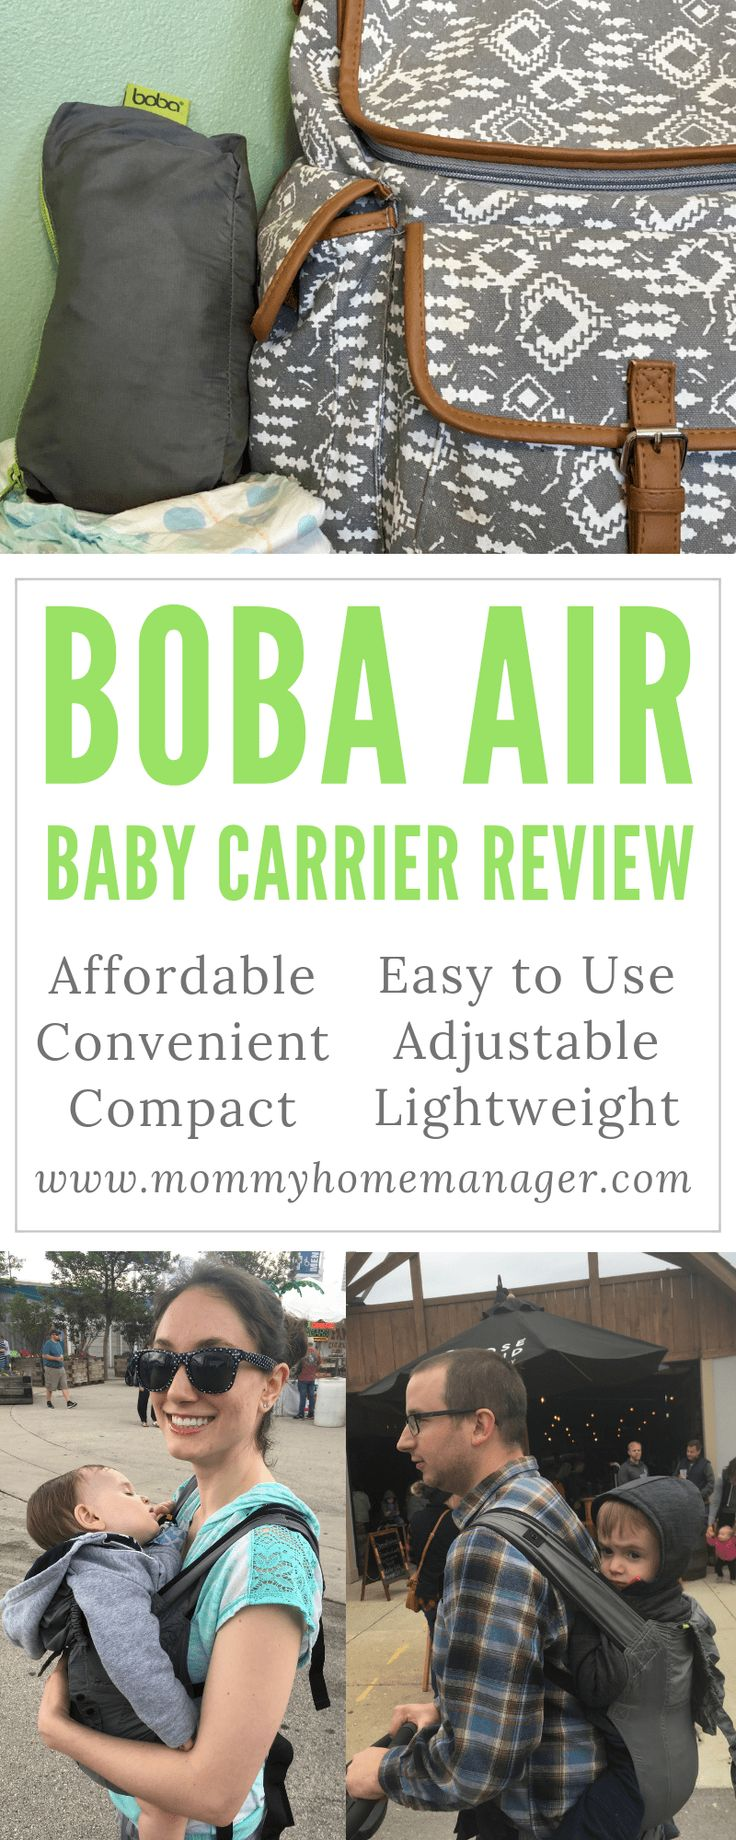 Boba Air Carrier Review Parenting Amp Motherhood Baby